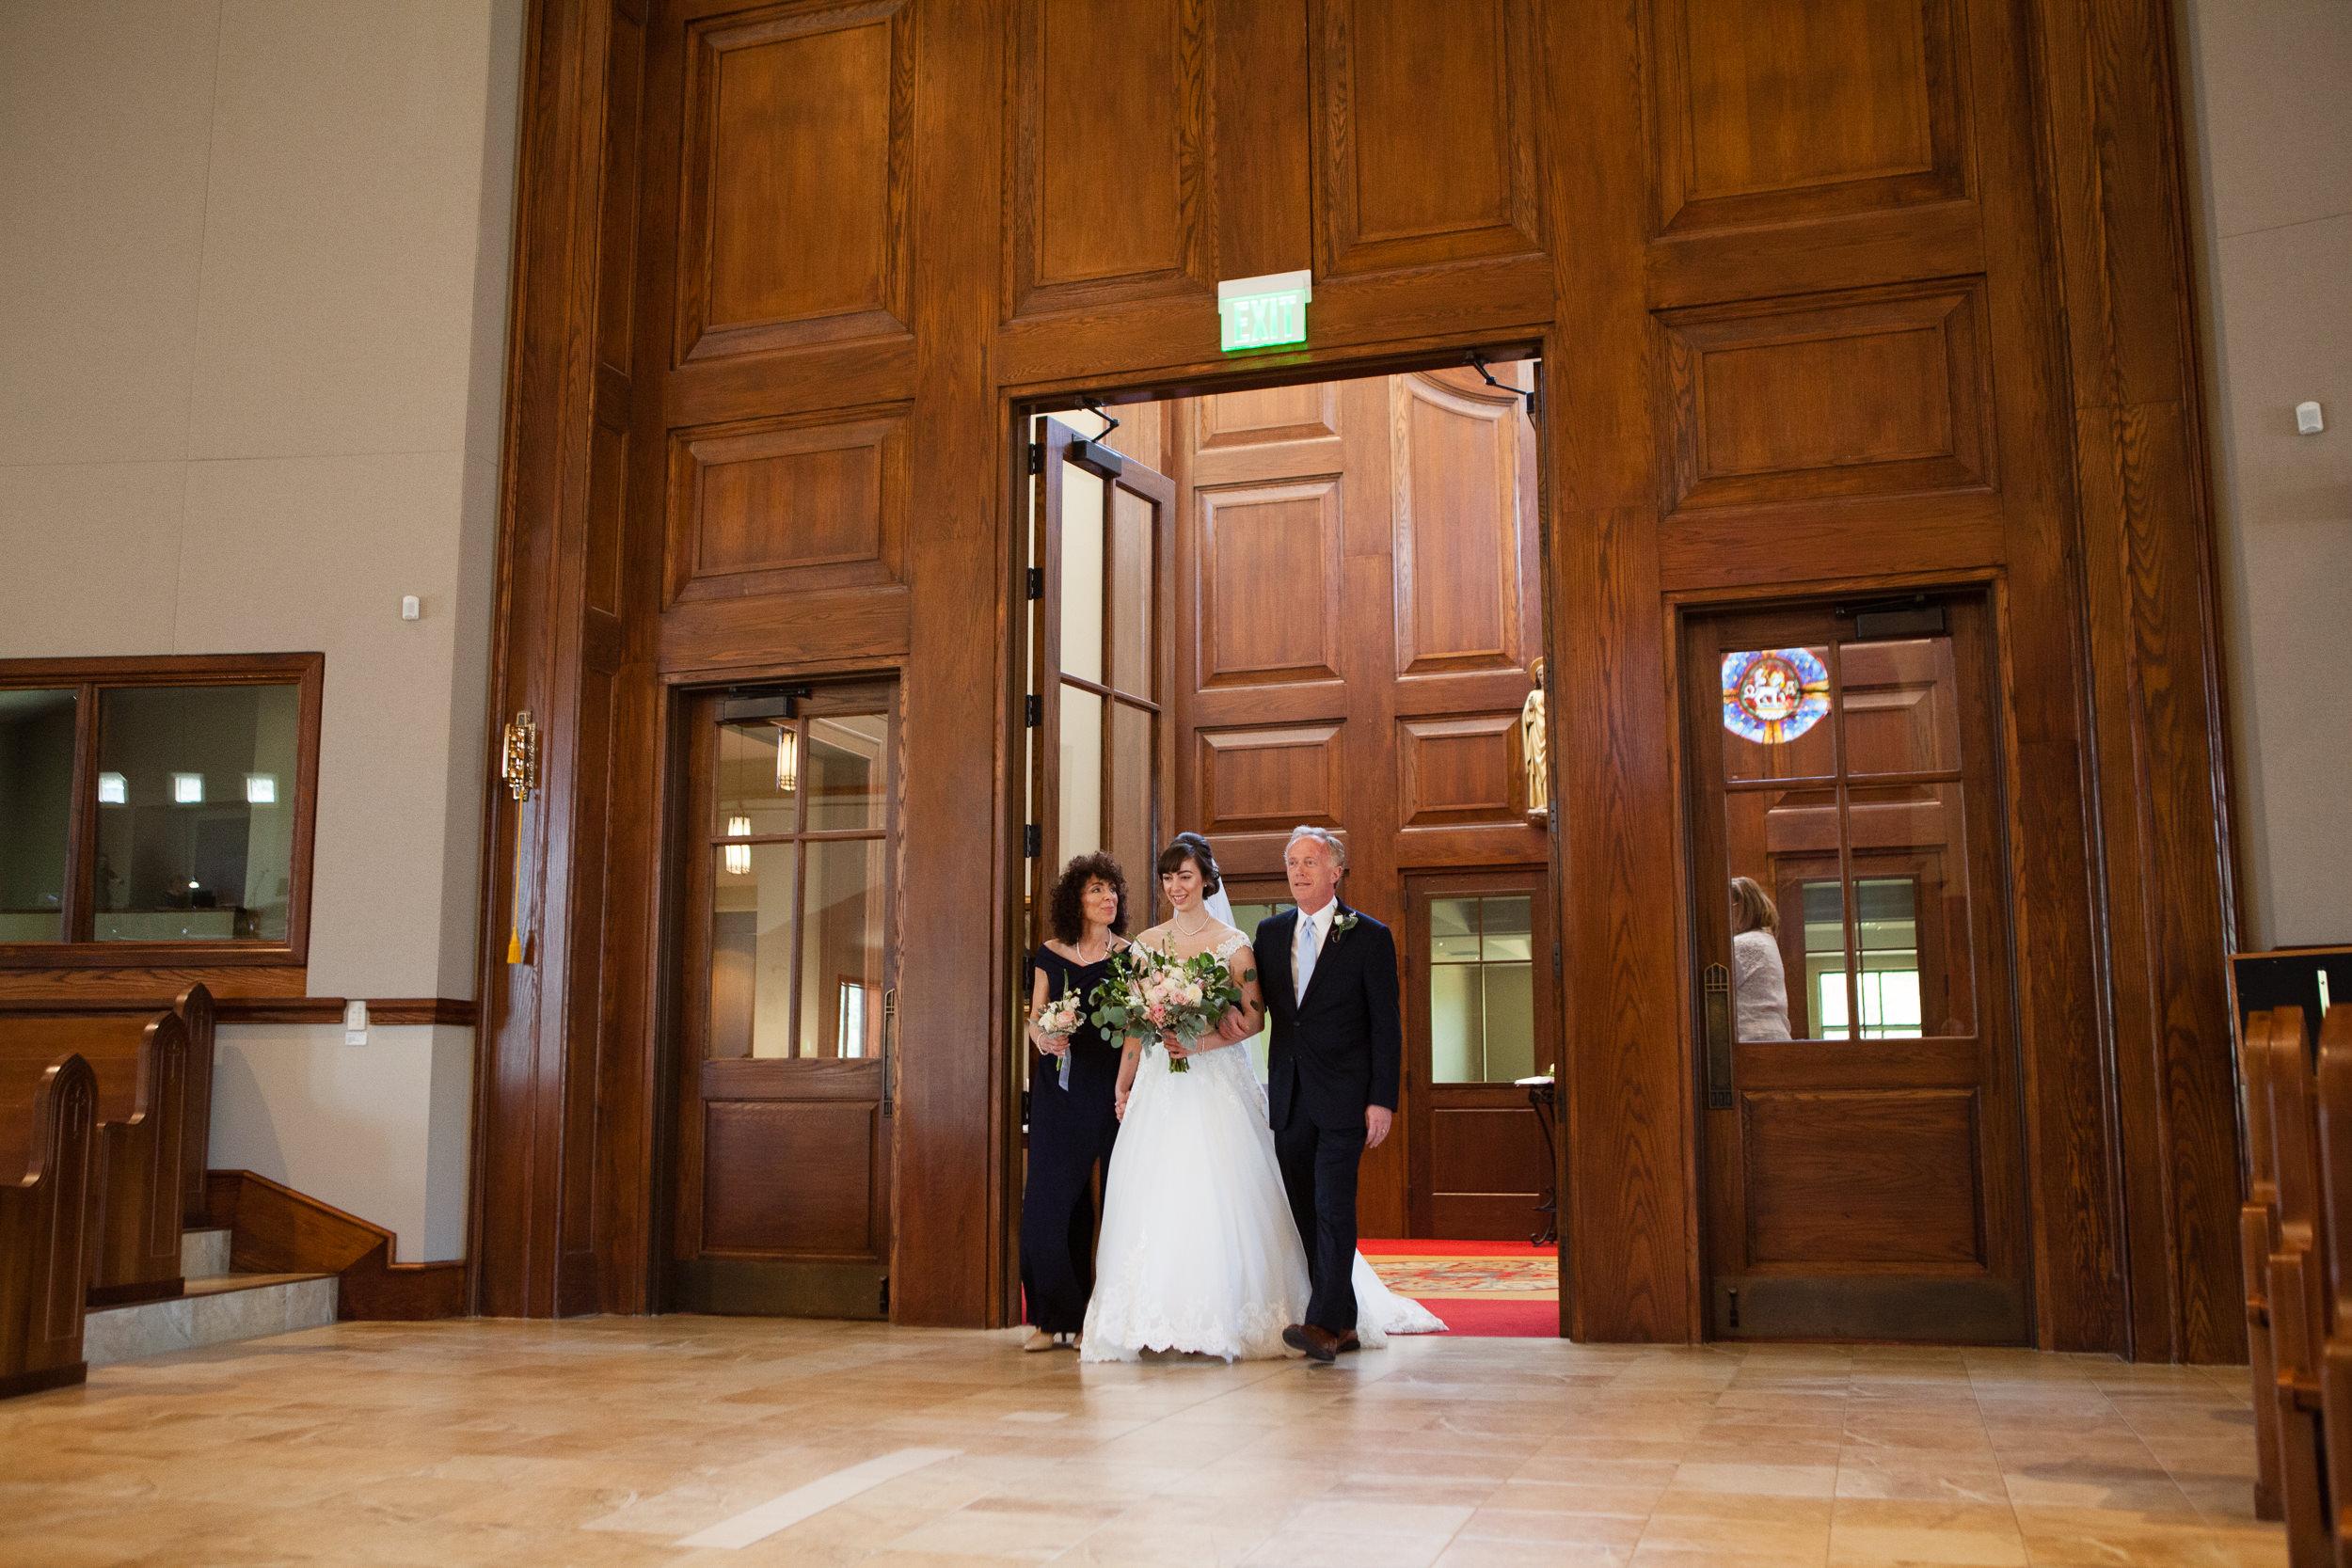 AB_Auburn_Wedding_2019-00030.jpg